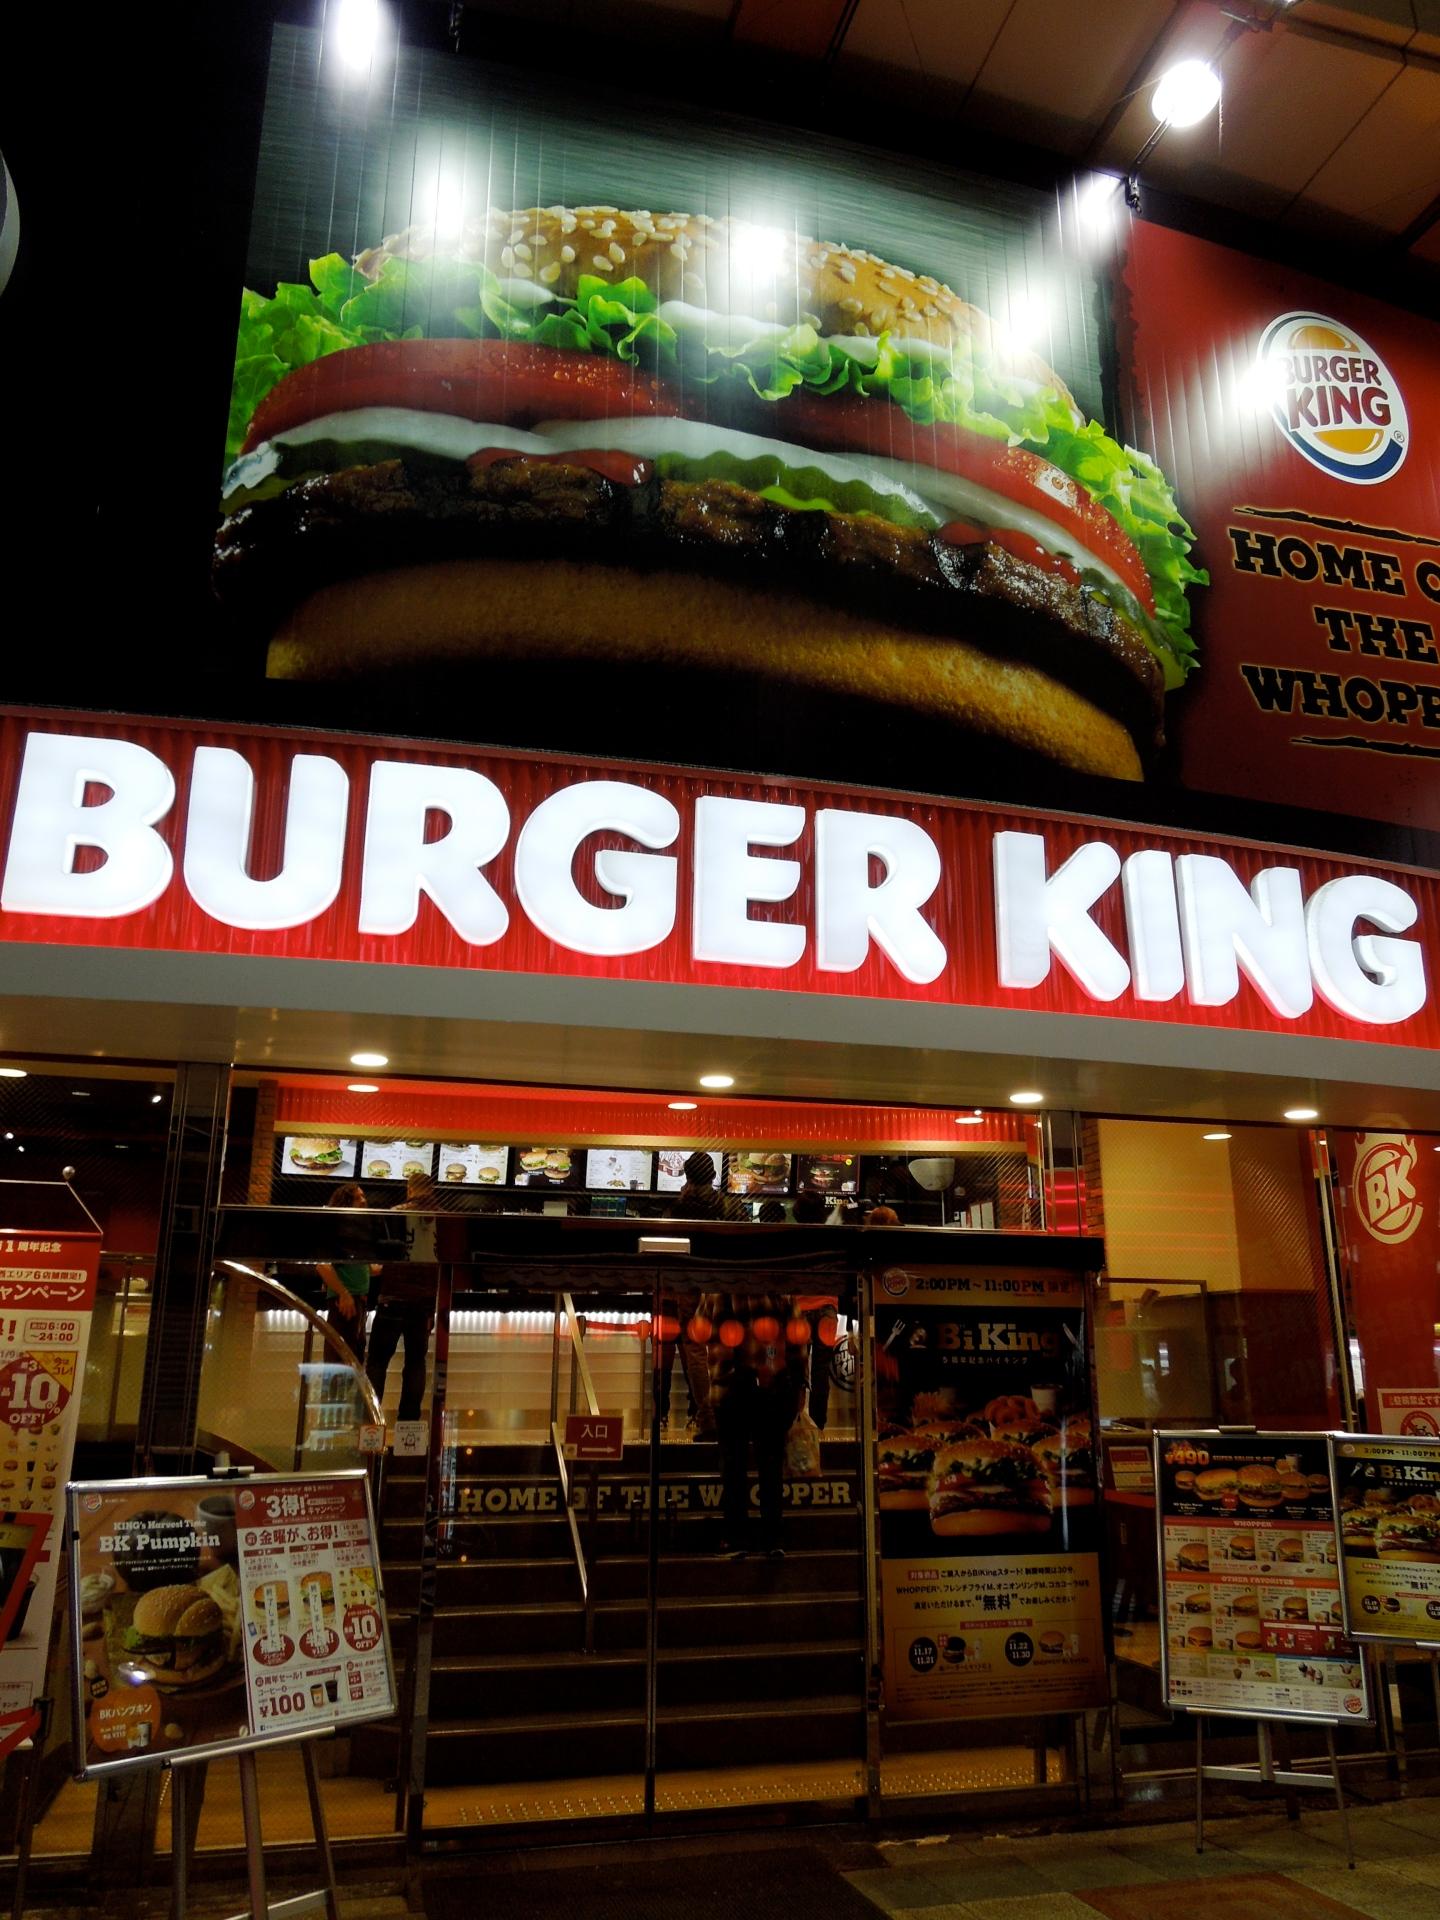 Outside of Burger King